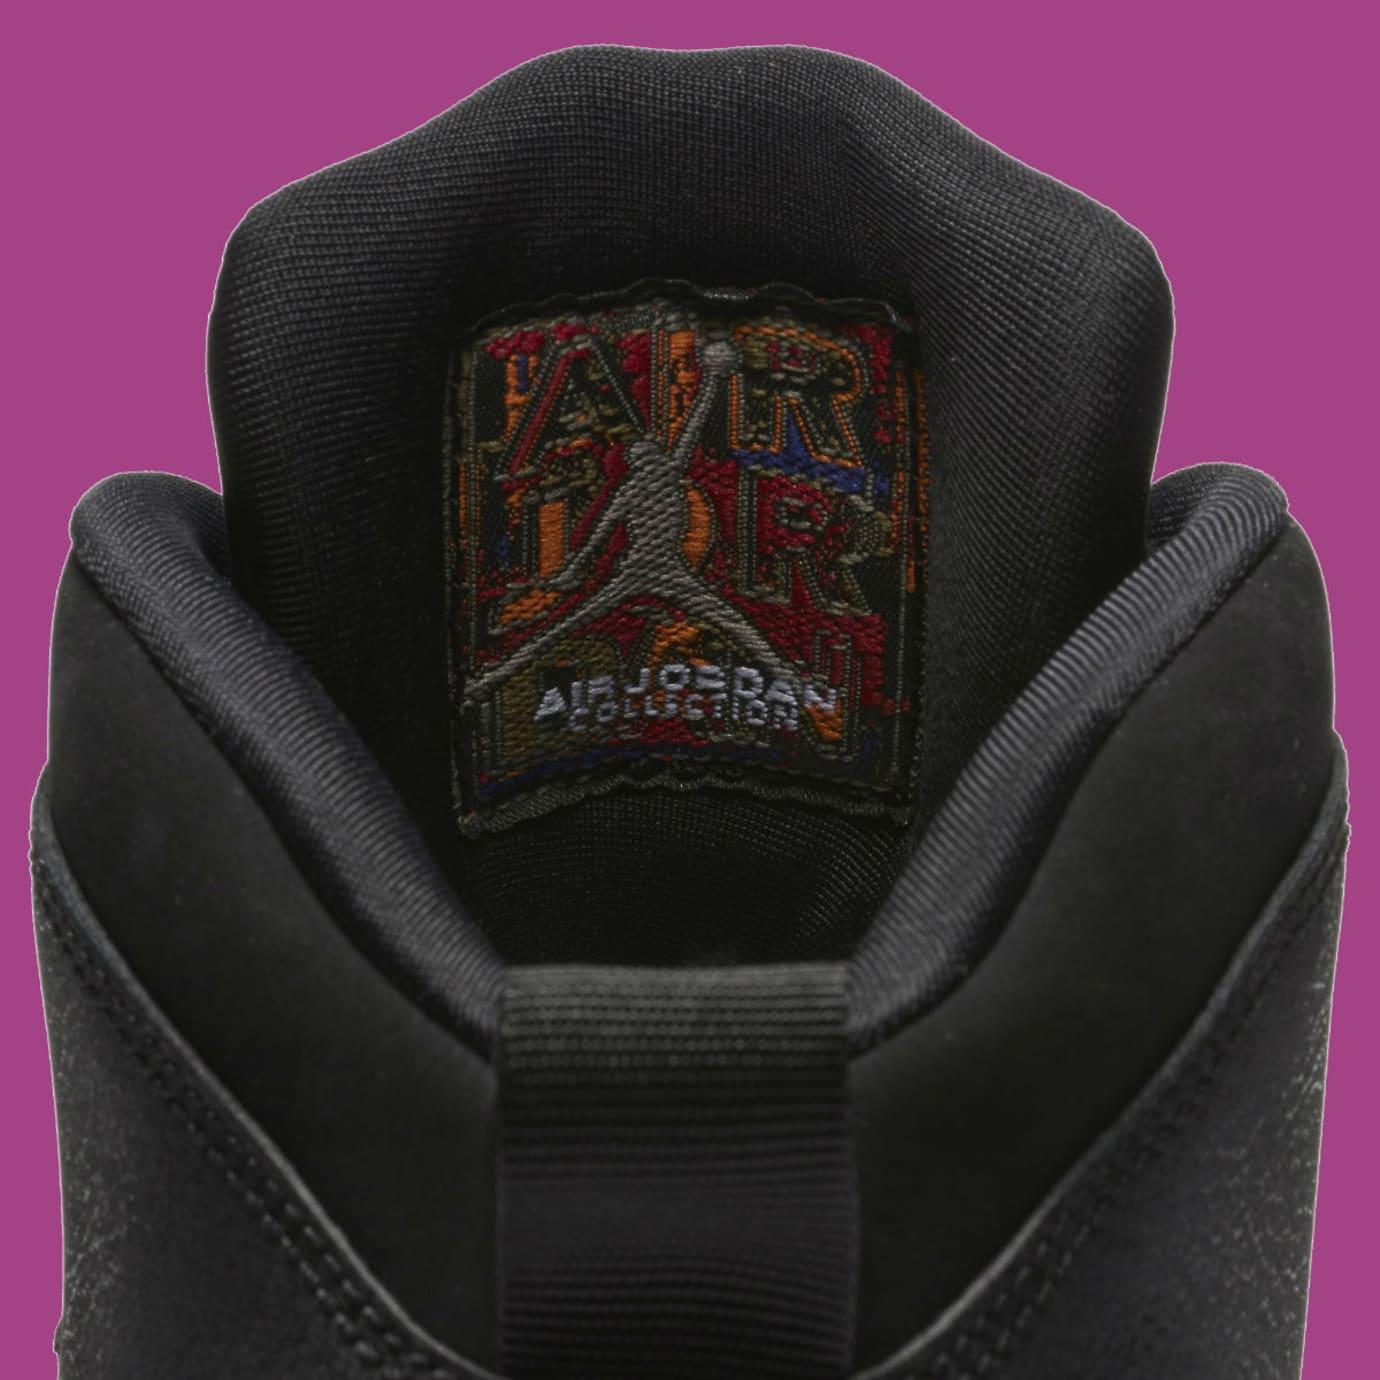 Air Jordan 10 X GS Fuchsia Blast Release Date 487211-017 Tongue